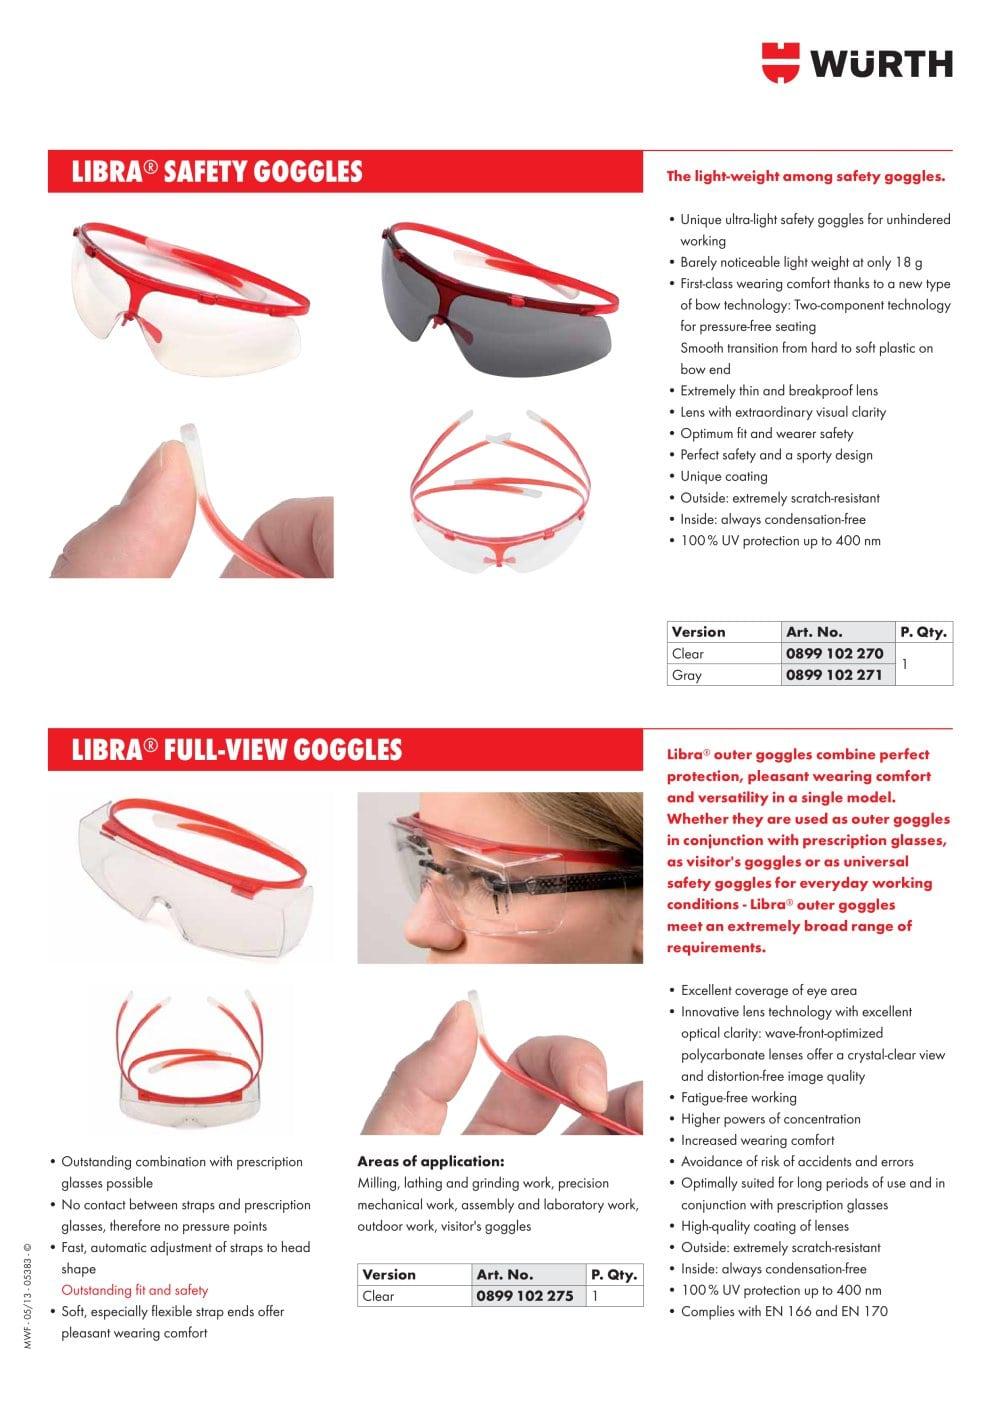 f1521d4988 SAFETY GOGGLES LIBRA - Adolf Würth GmbH   Co. KG - PDF Catalogs ...